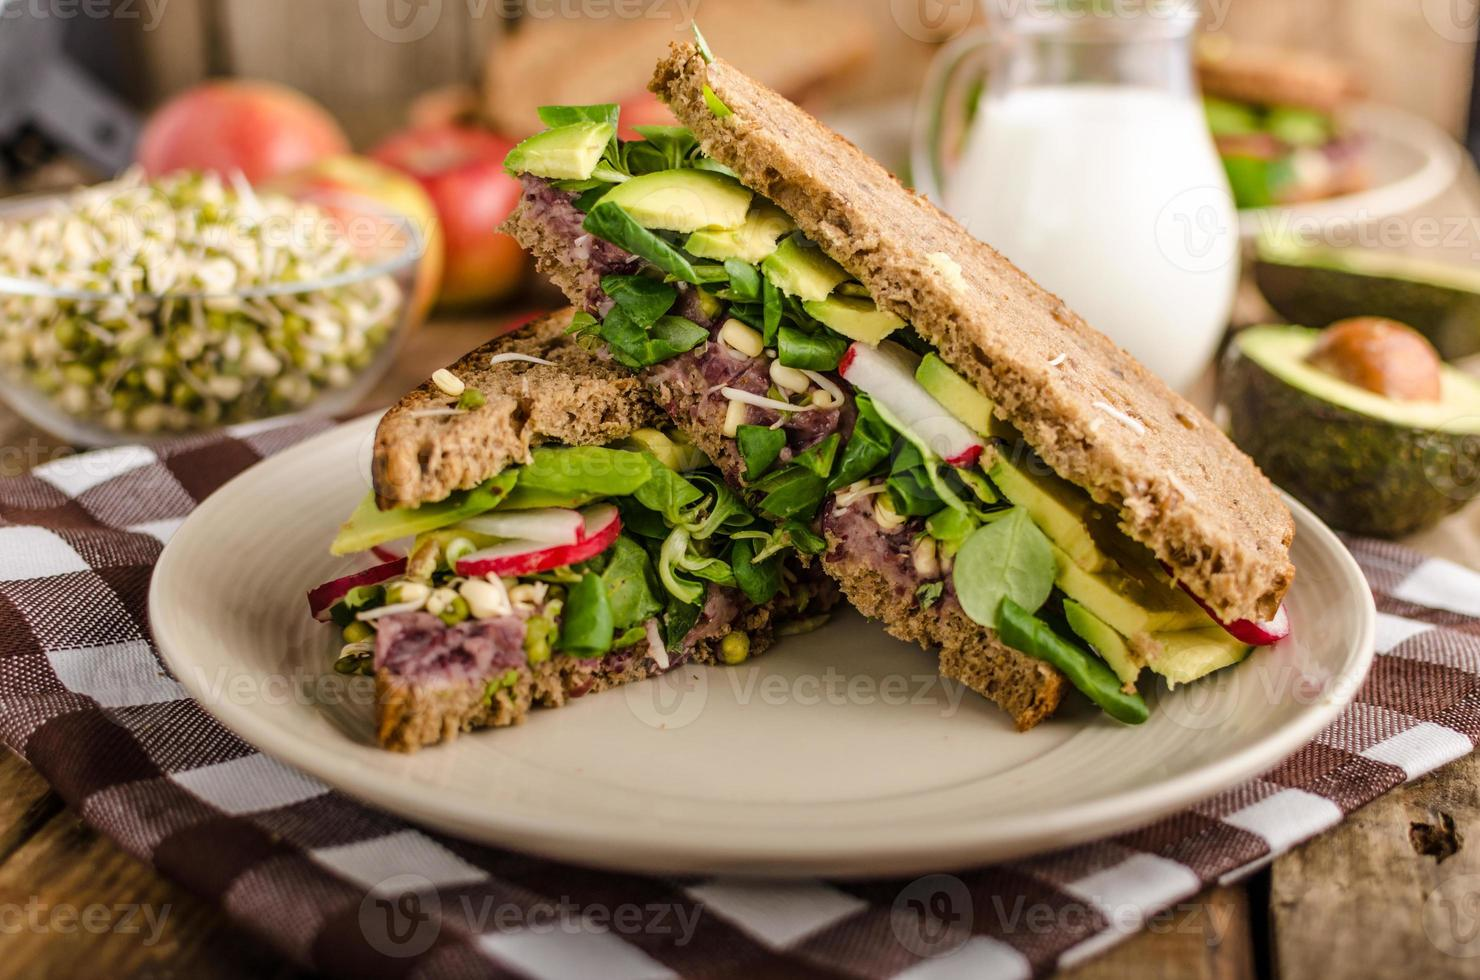 Chipotle-Avocado-Sommer-Sandwich-Rezept foto